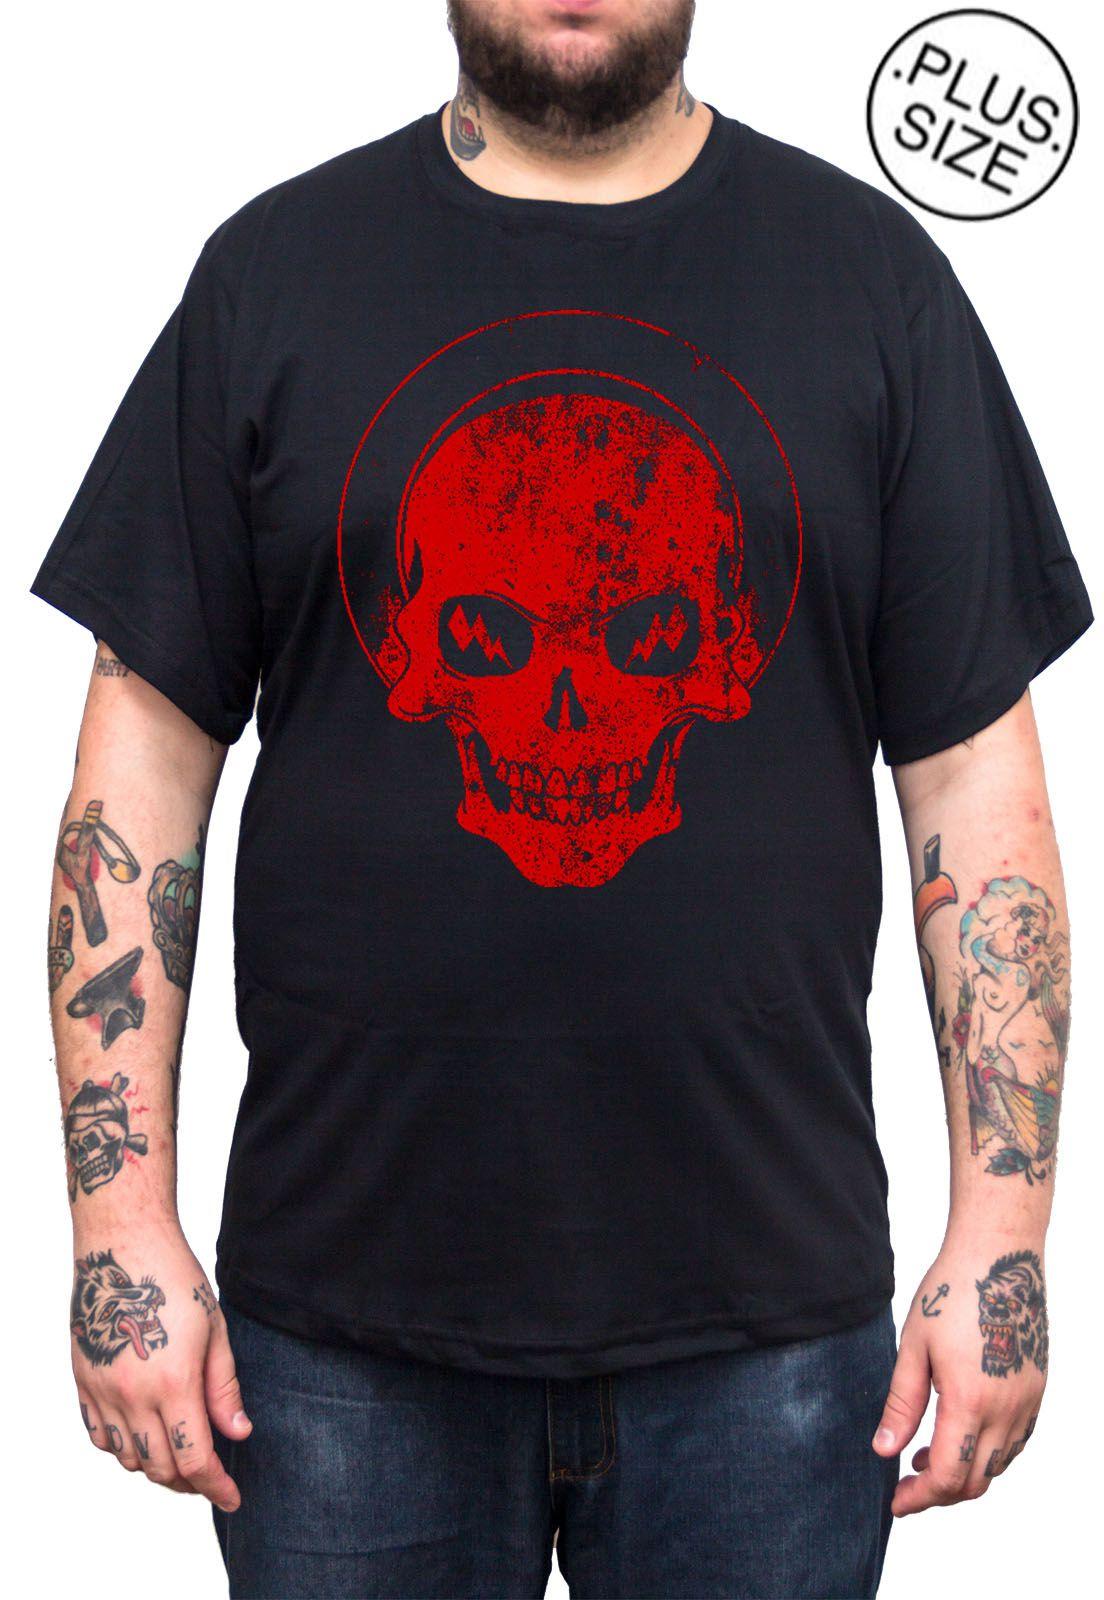 Camiseta Hshop Recovered - Preta - Plus Size - Tamanho Grande XG  - HShop